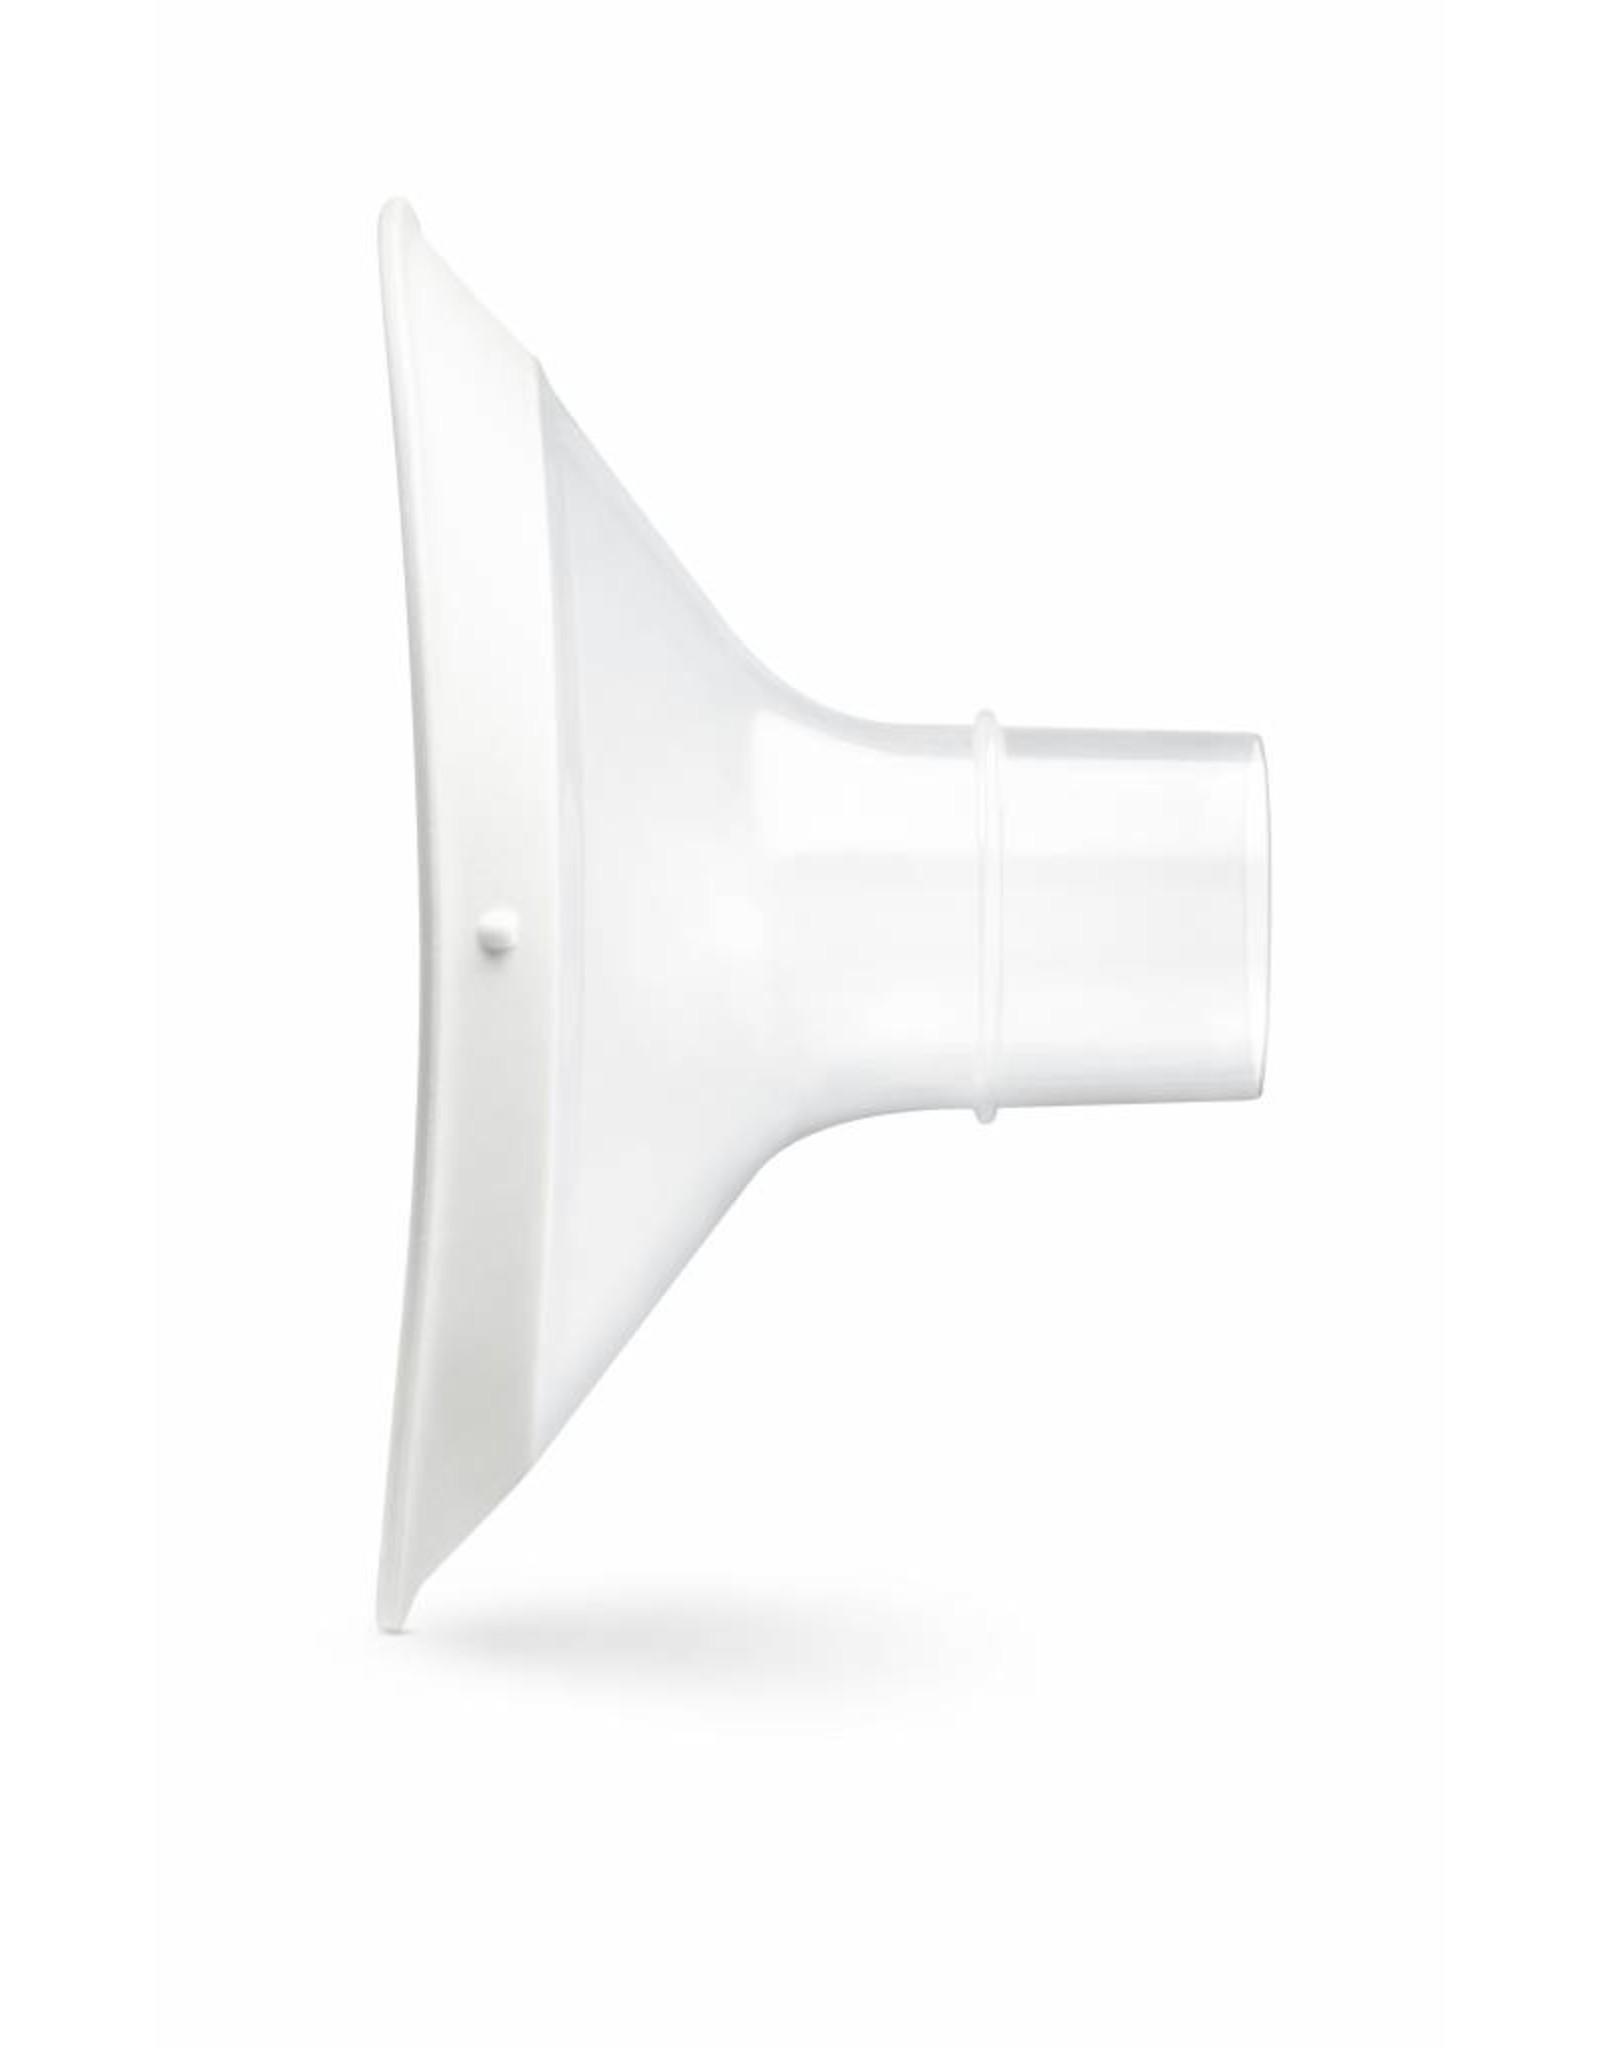 Medela Medela PersonalFit Flex, 2 Brusthauben Grösse M (24mm)